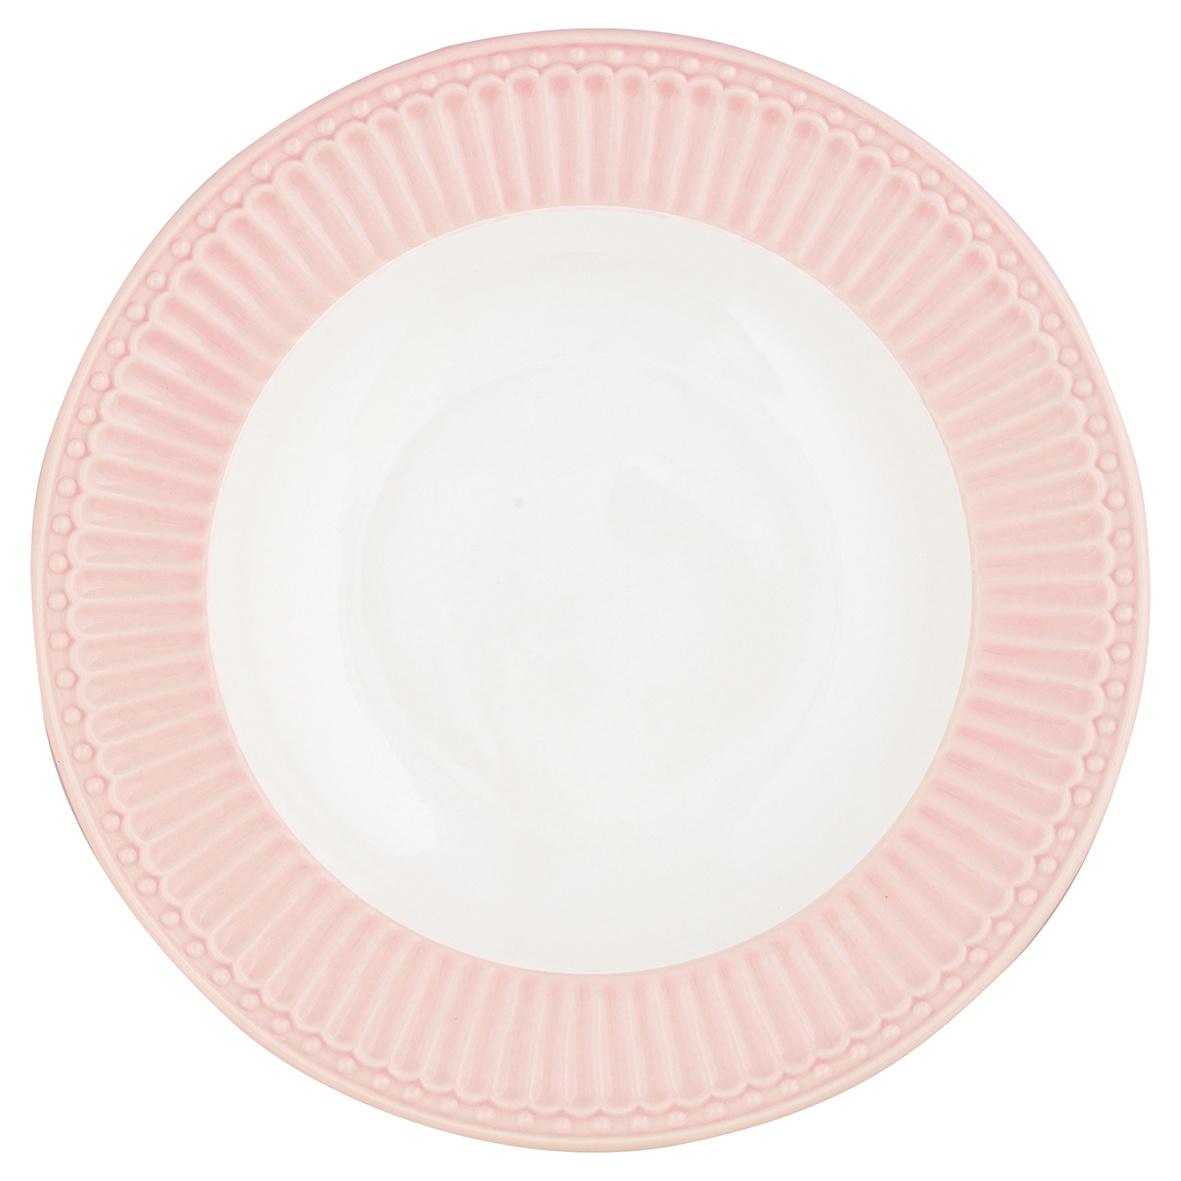 Глубокая тарелка Greengate Alice pale pink 21,5 см